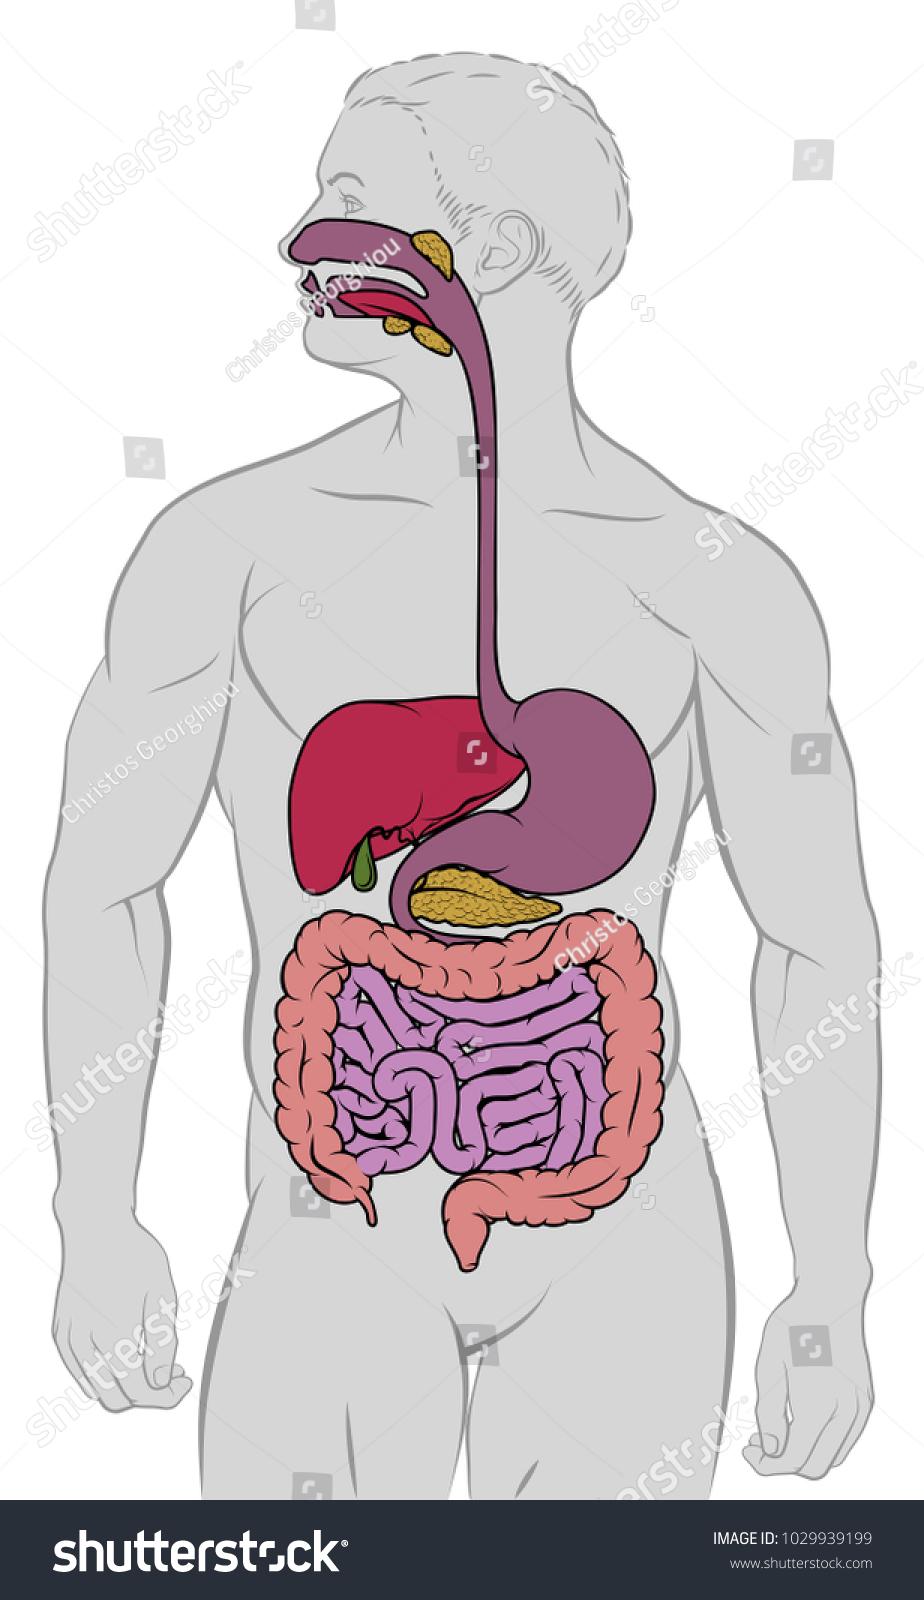 Human Anatomy Digestive System Gut Gastrointestinal Stock ...